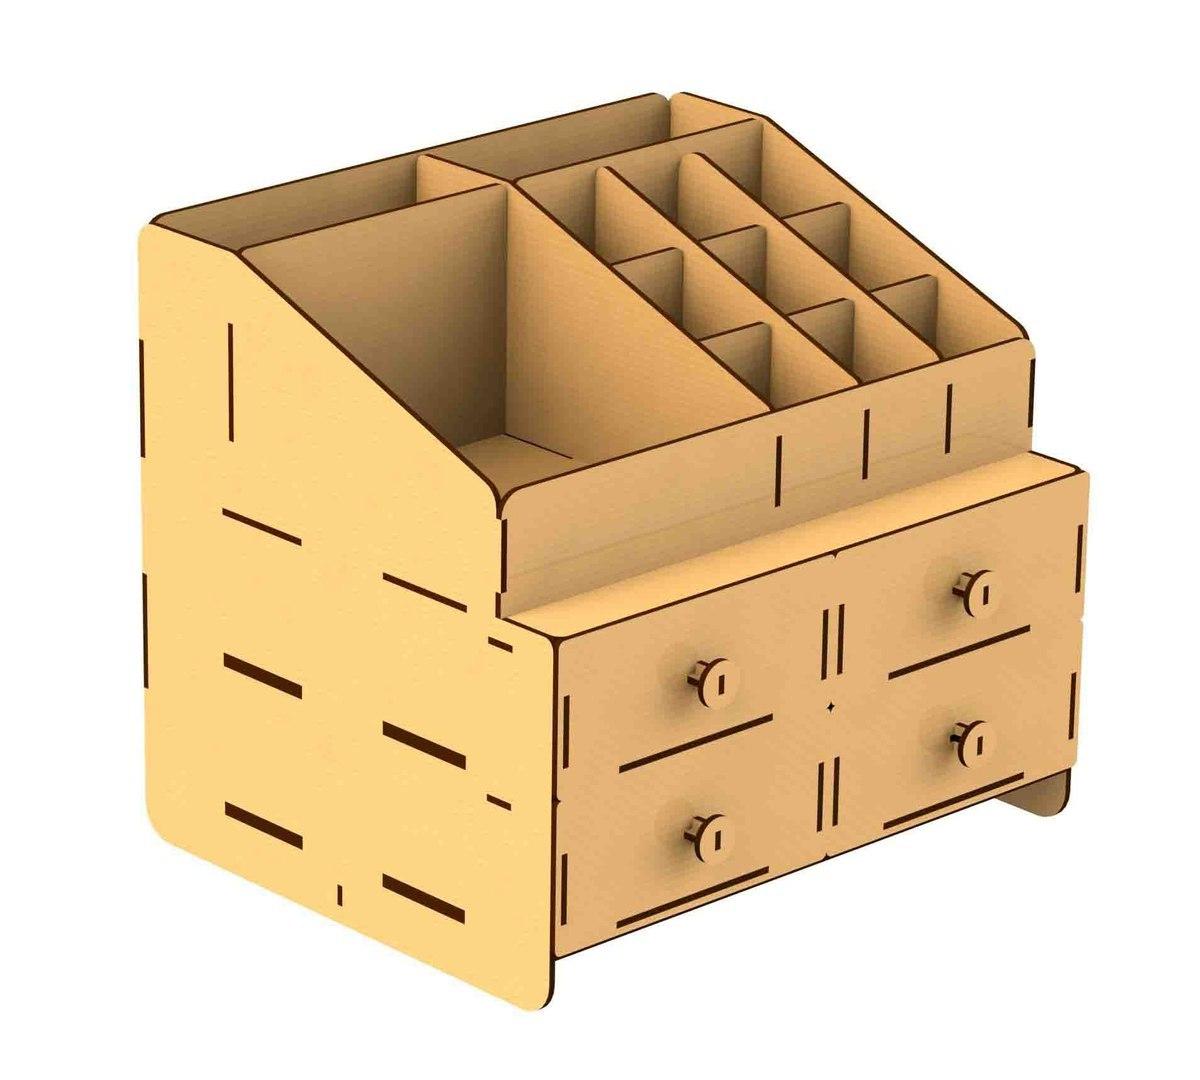 Somod Wooden Storage Box Laser Cut Free CDR Vectors Art